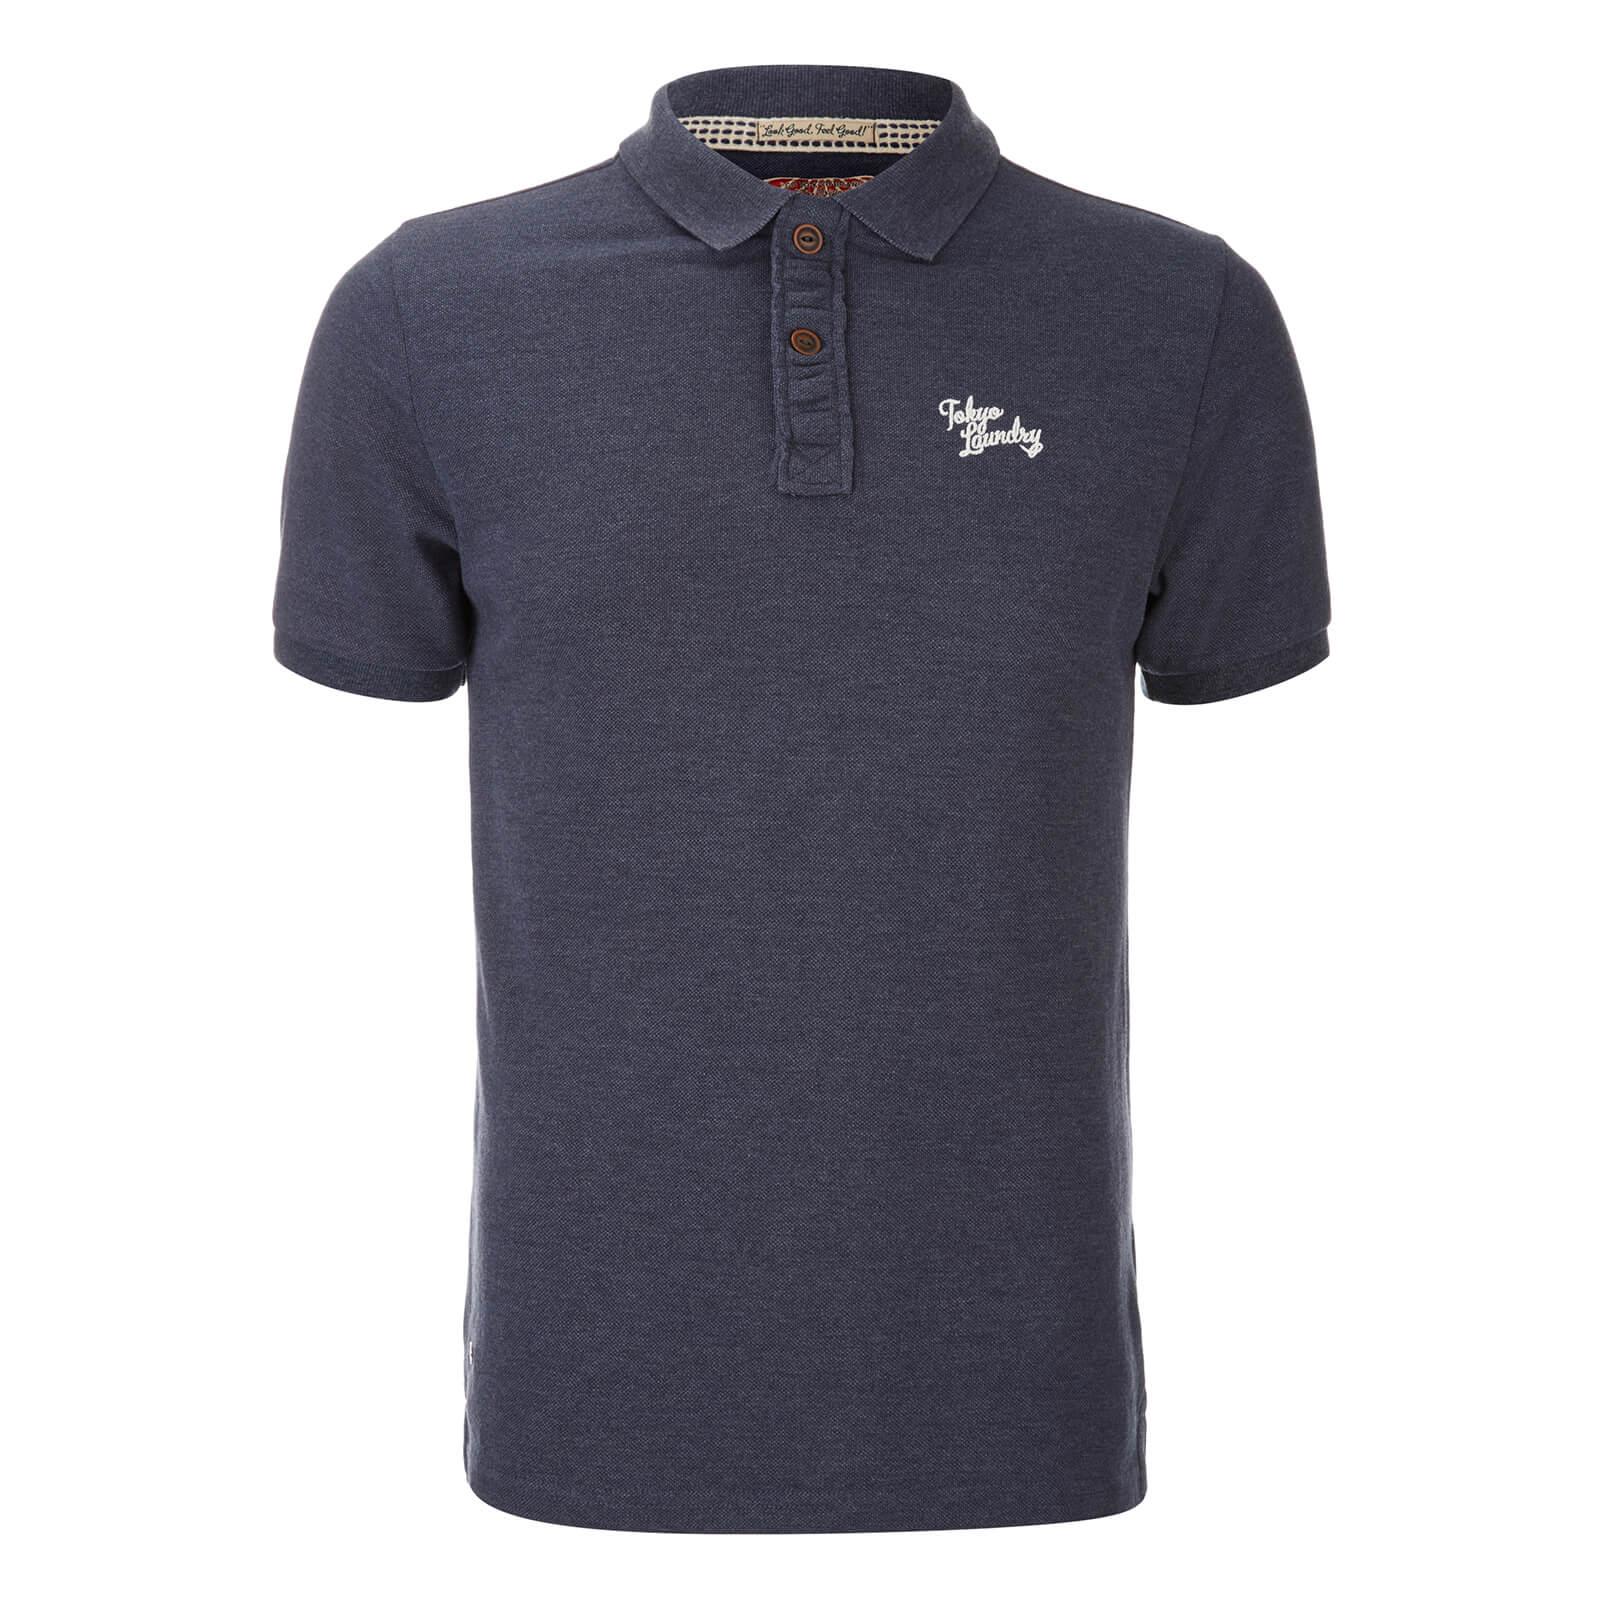 Tokyo Laundry Mens Penn State Polo Shirt Mood Indigo Marl